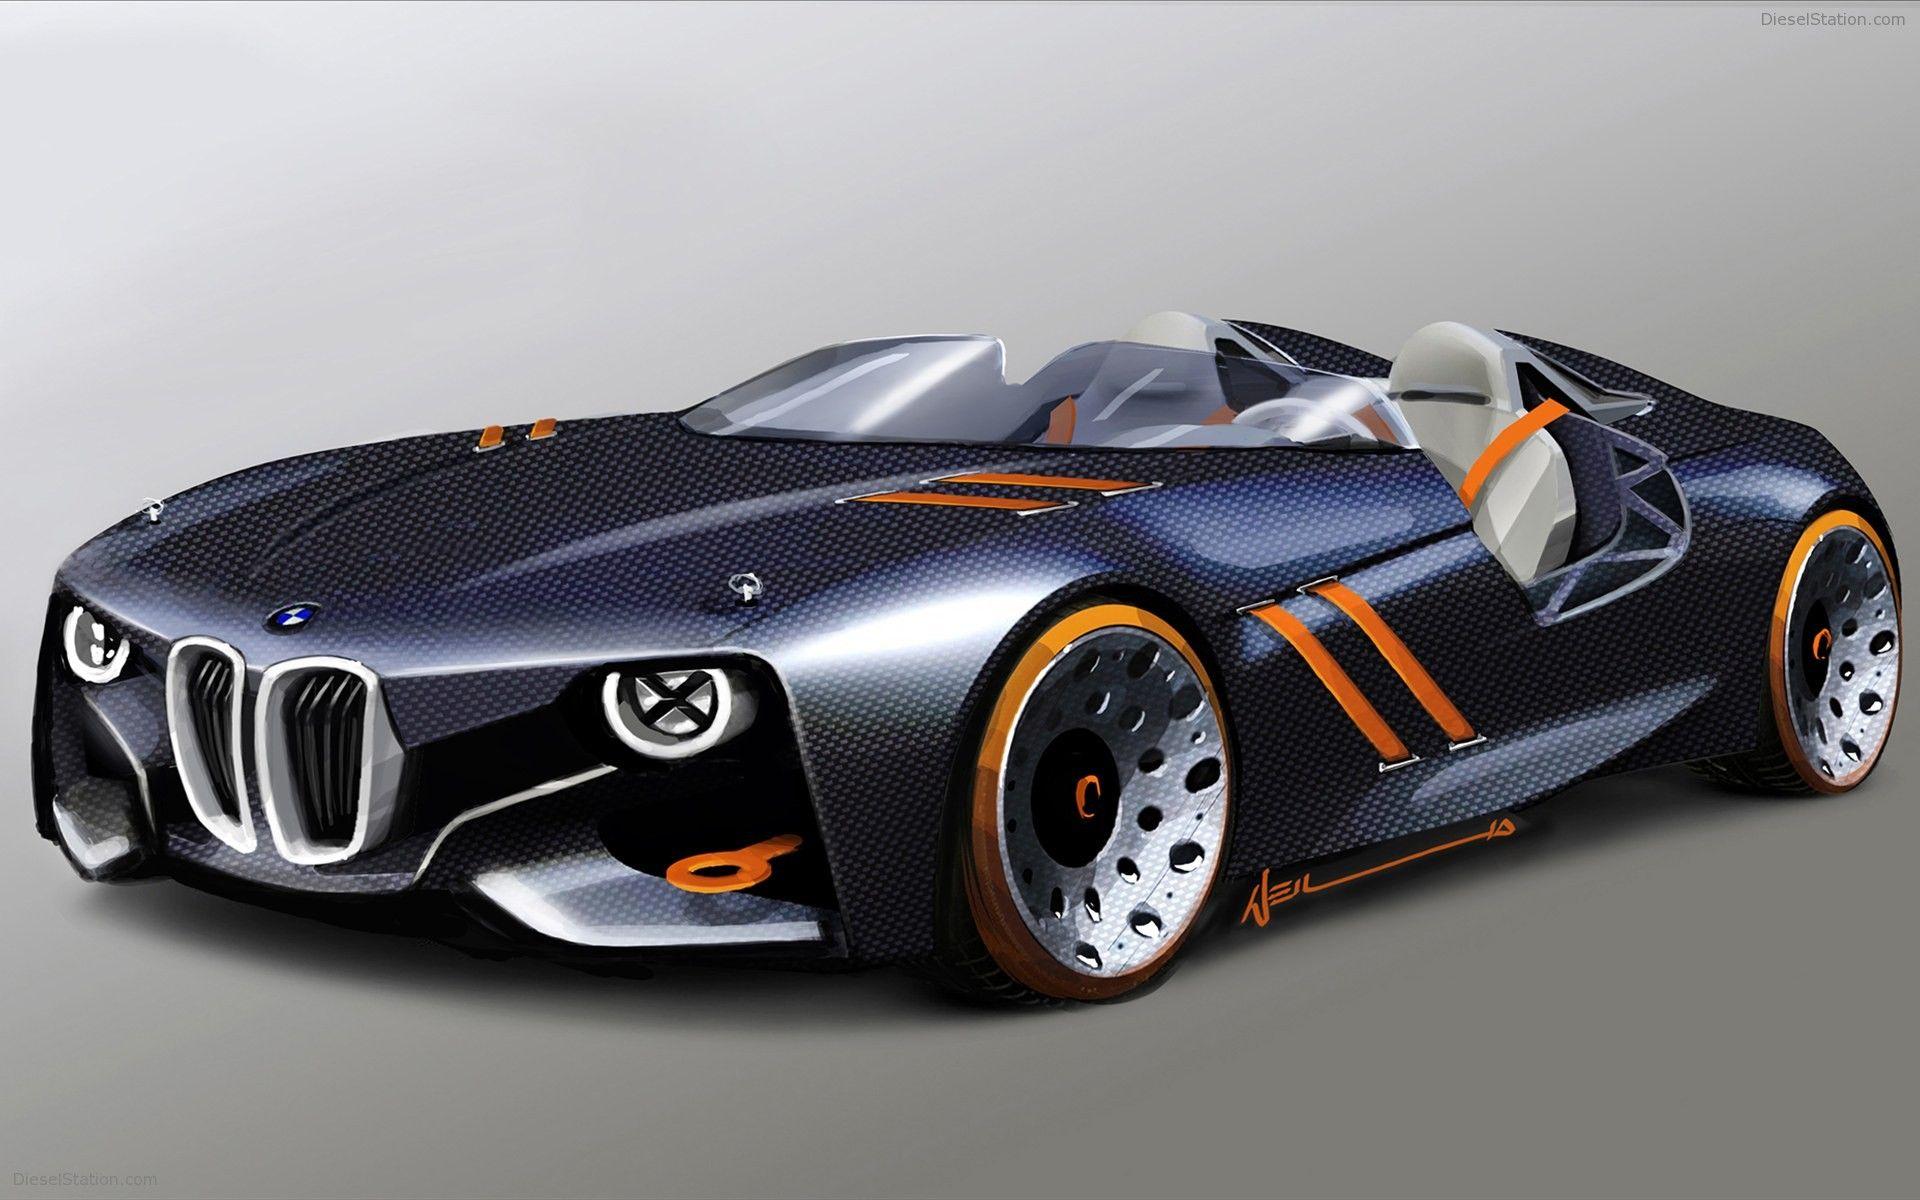 Bmw 328 Hommage Concept 2011 Repinned By Www Blickedeeler De Follow Us On Www Facebook Com Blickedeeler Concepto Bmw Bmw Autos Autos Lujosos